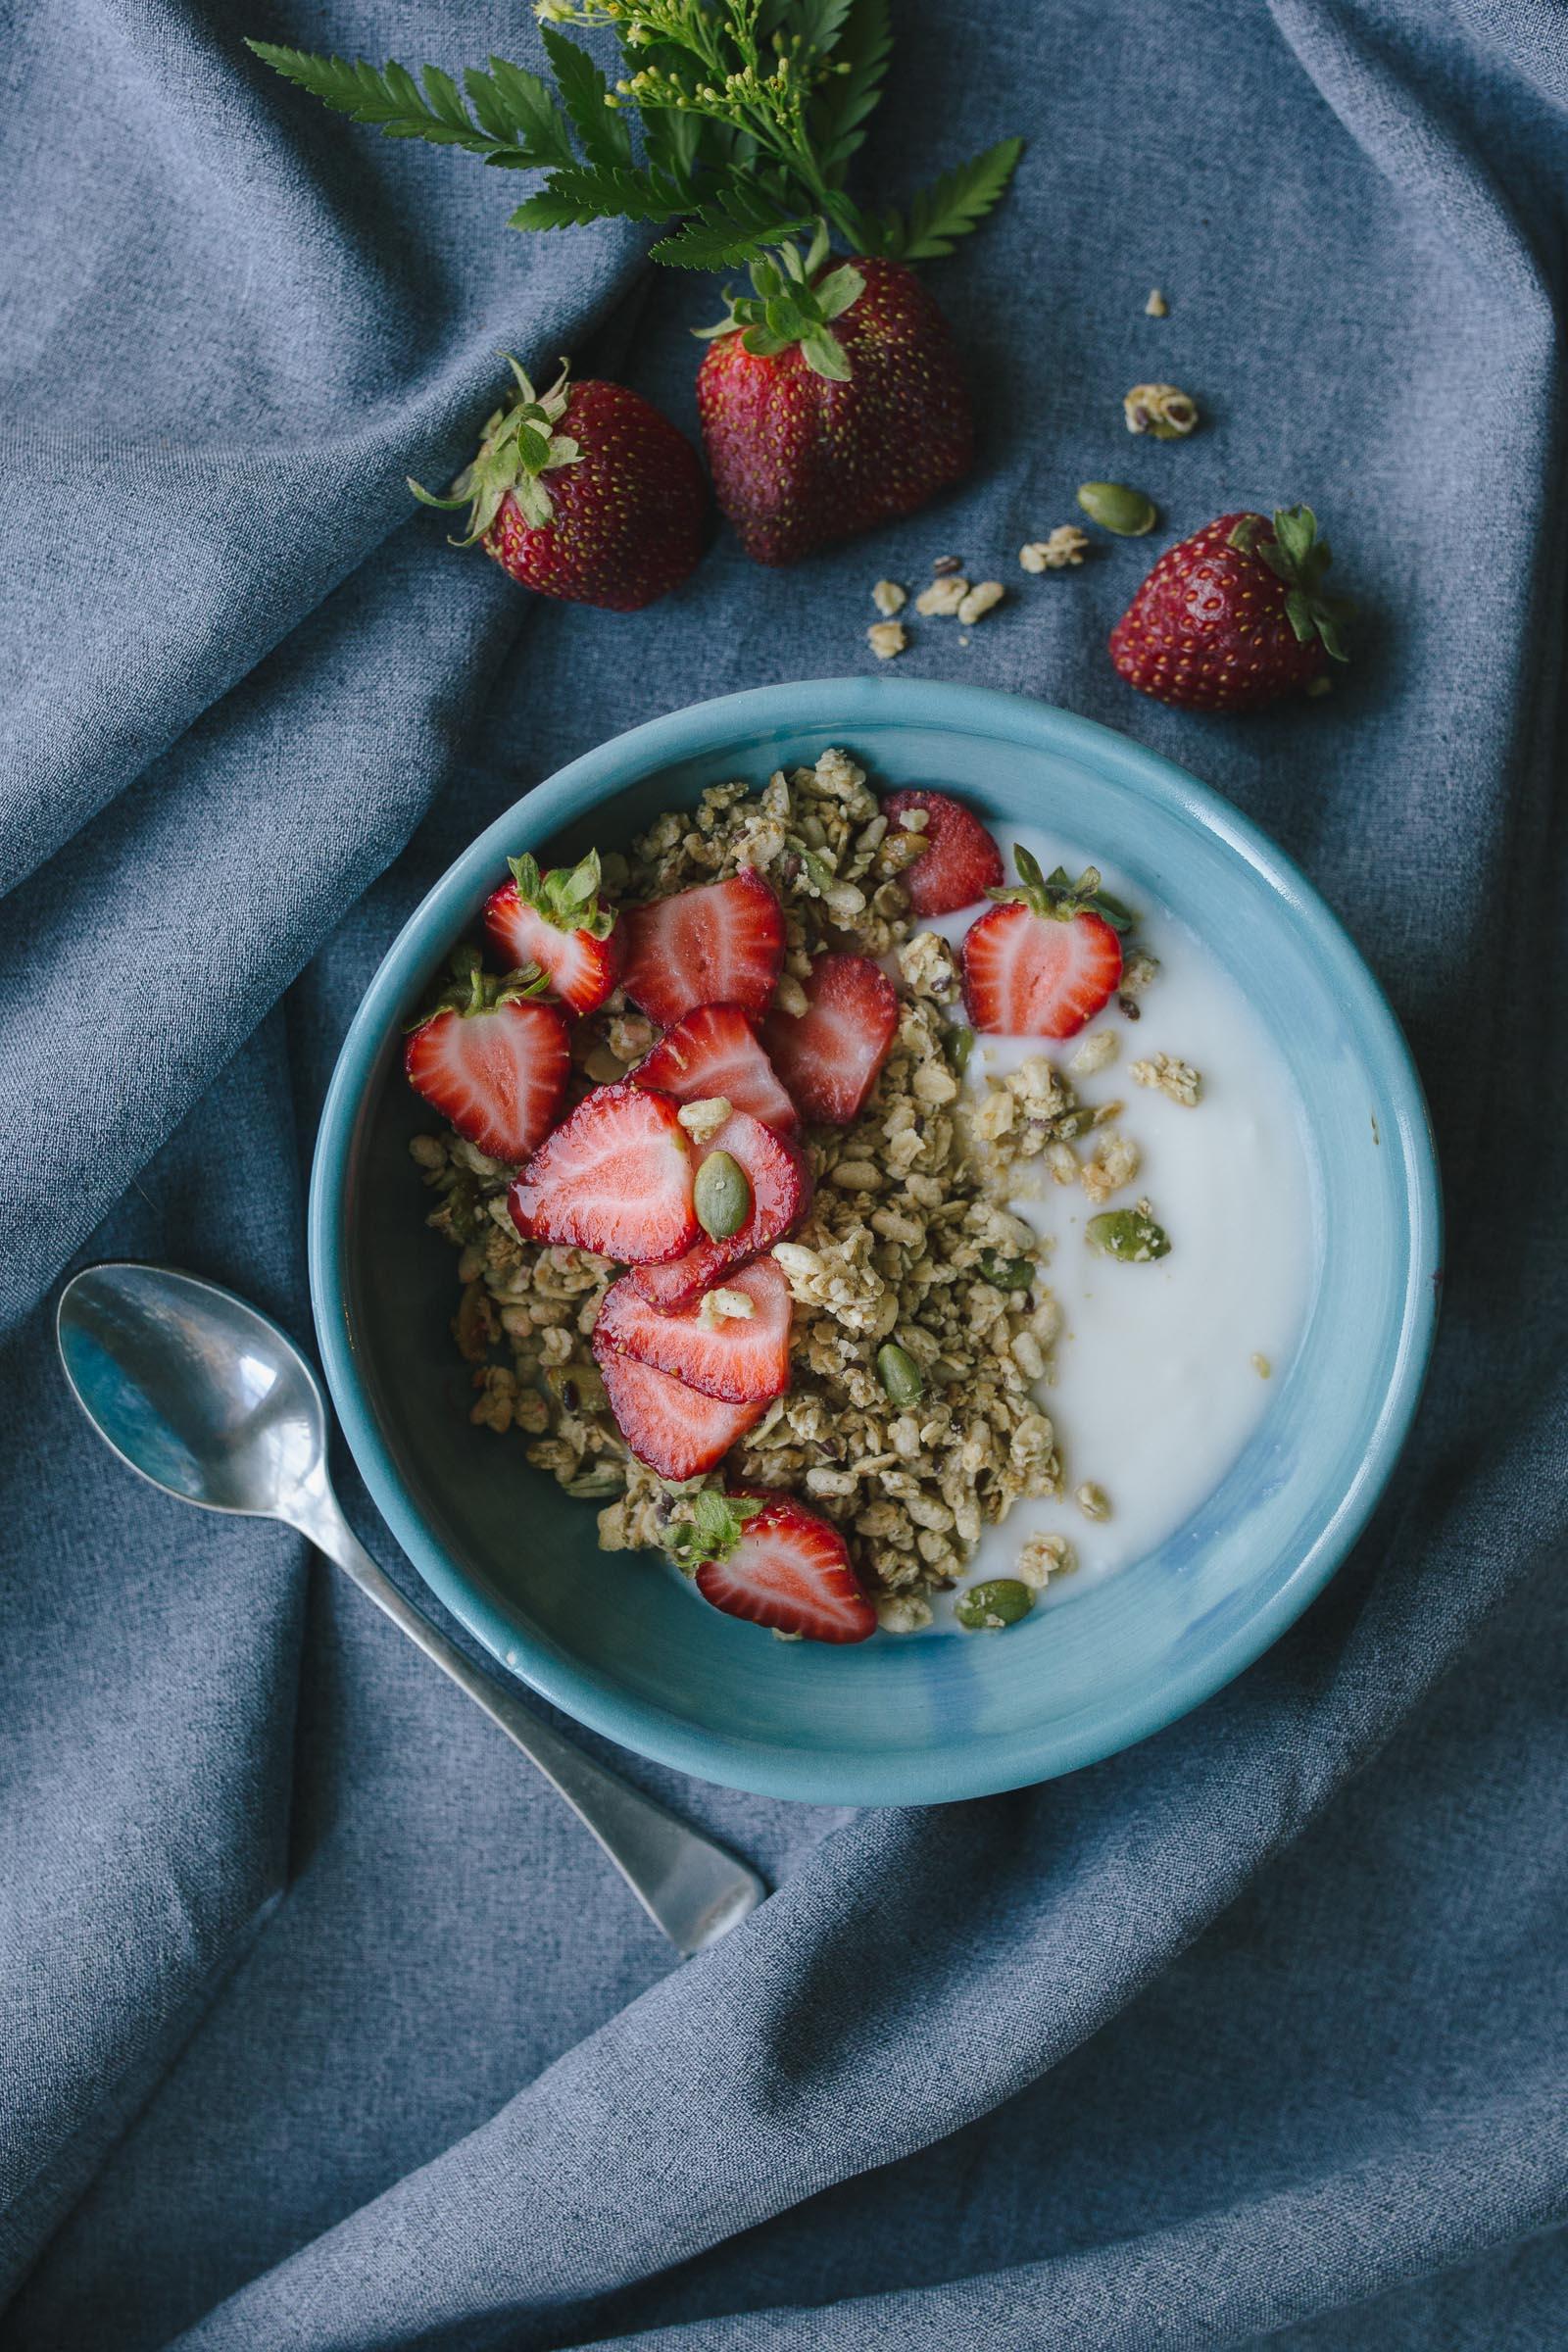 ja-np-breakfast-5163.jpg